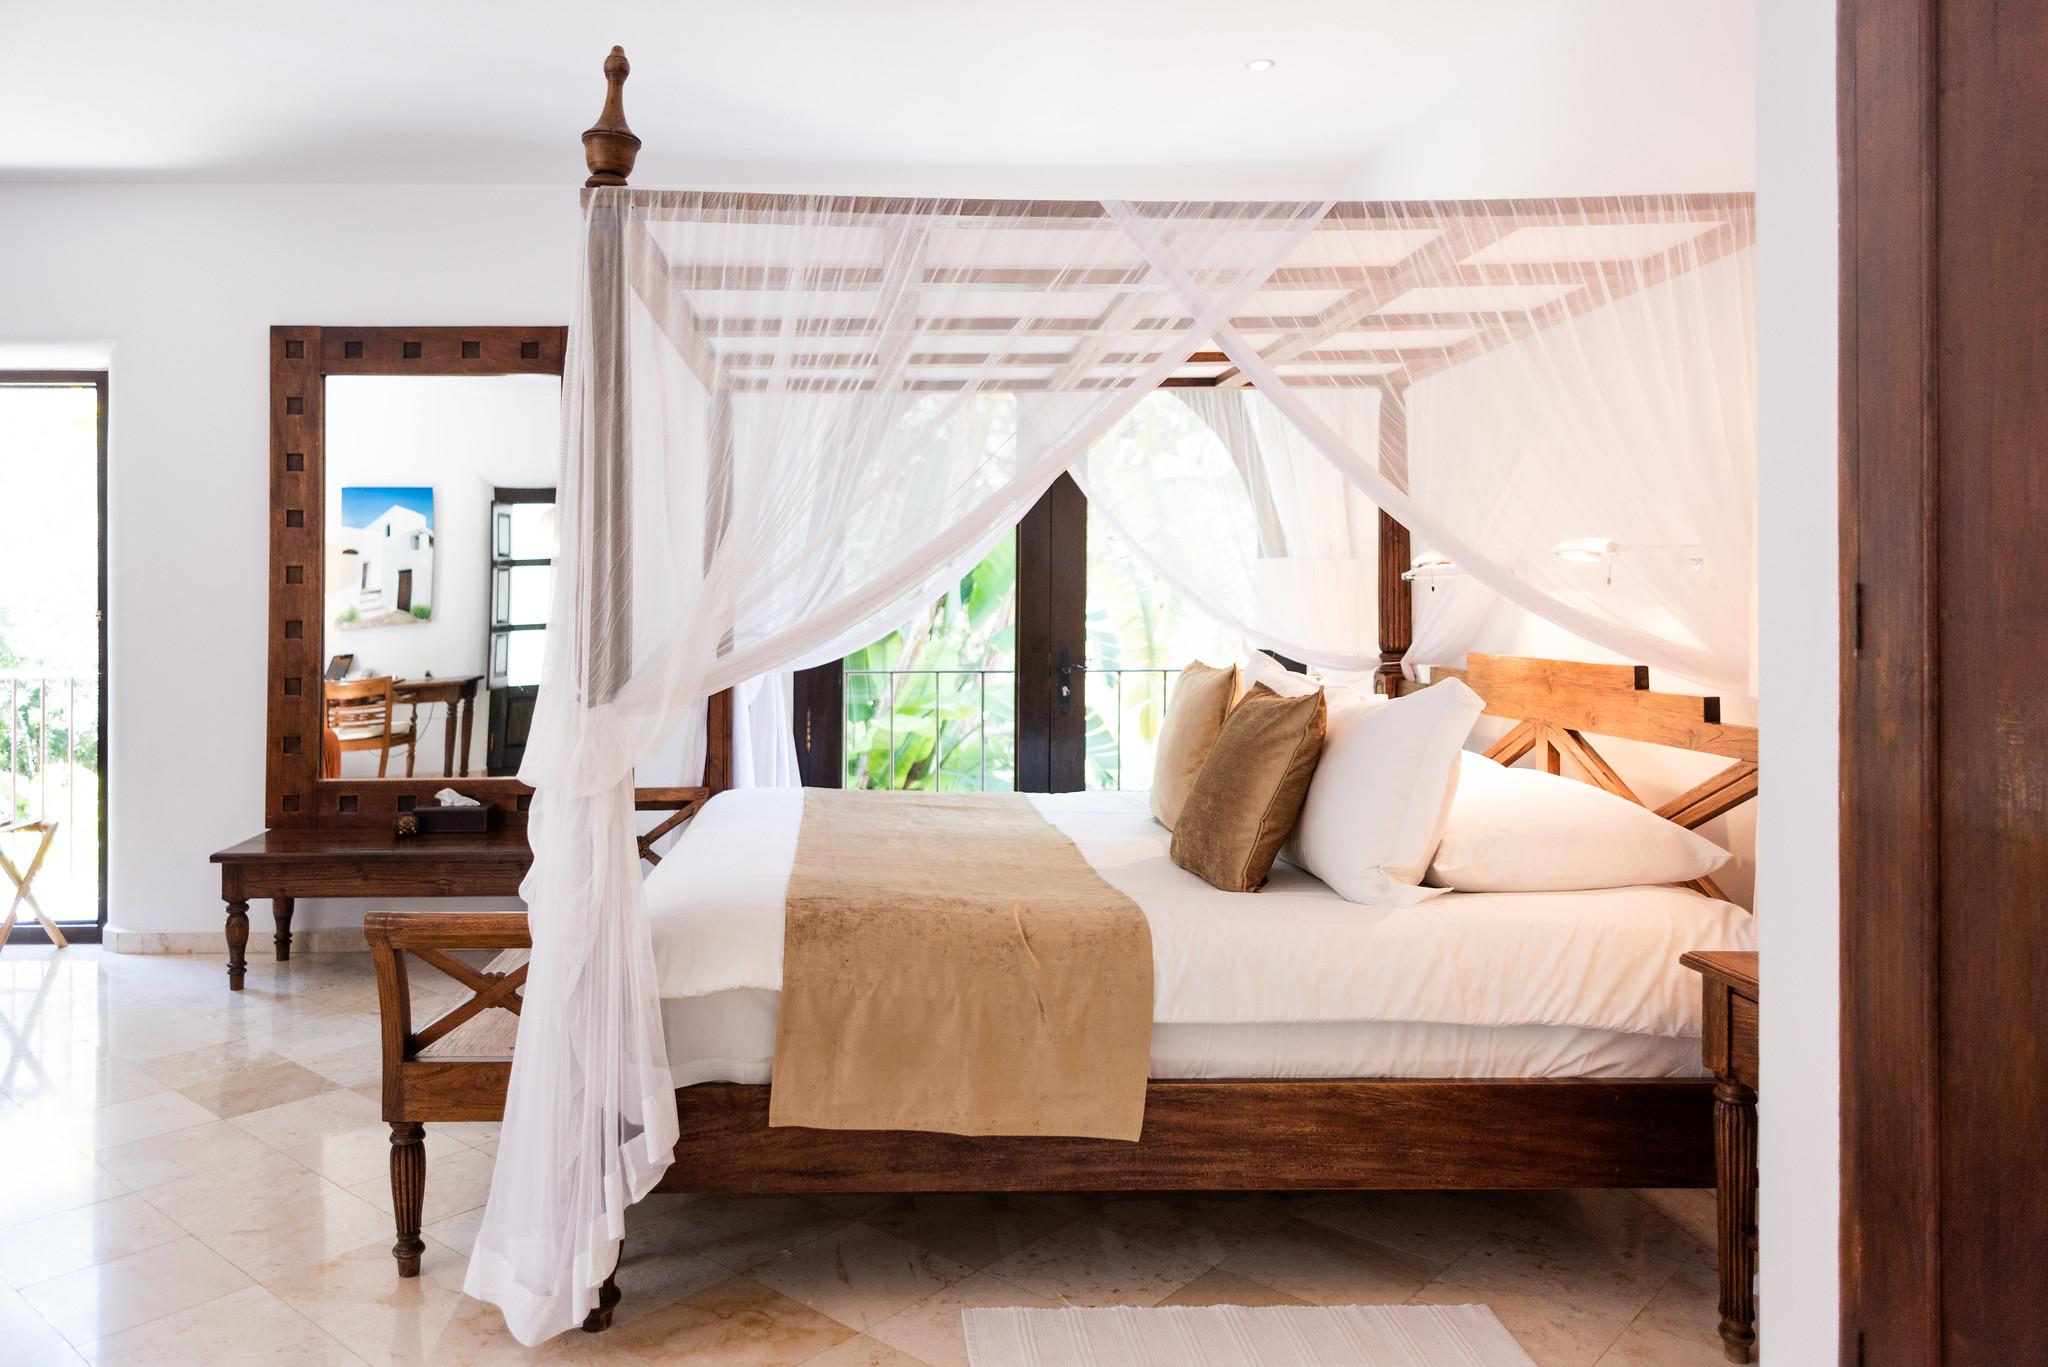 https://www.white-ibiza.com/wp-content/uploads/2019/11/ibiza-hotels-agoturismos-agroturismo-atzaro-03.jpg